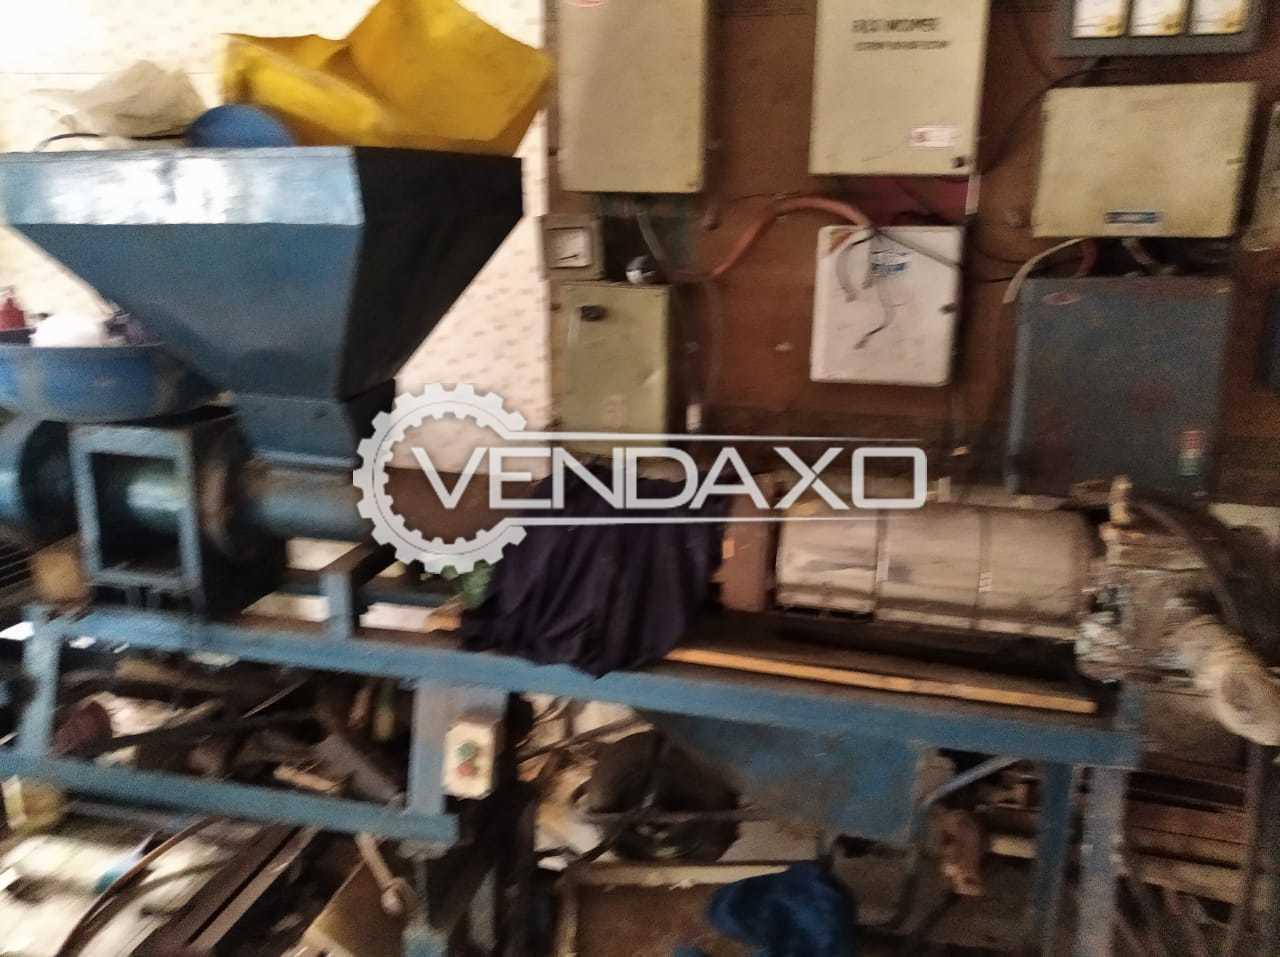 For Sale Used LLDP Dana Making Machine - 2000 KG Per Day